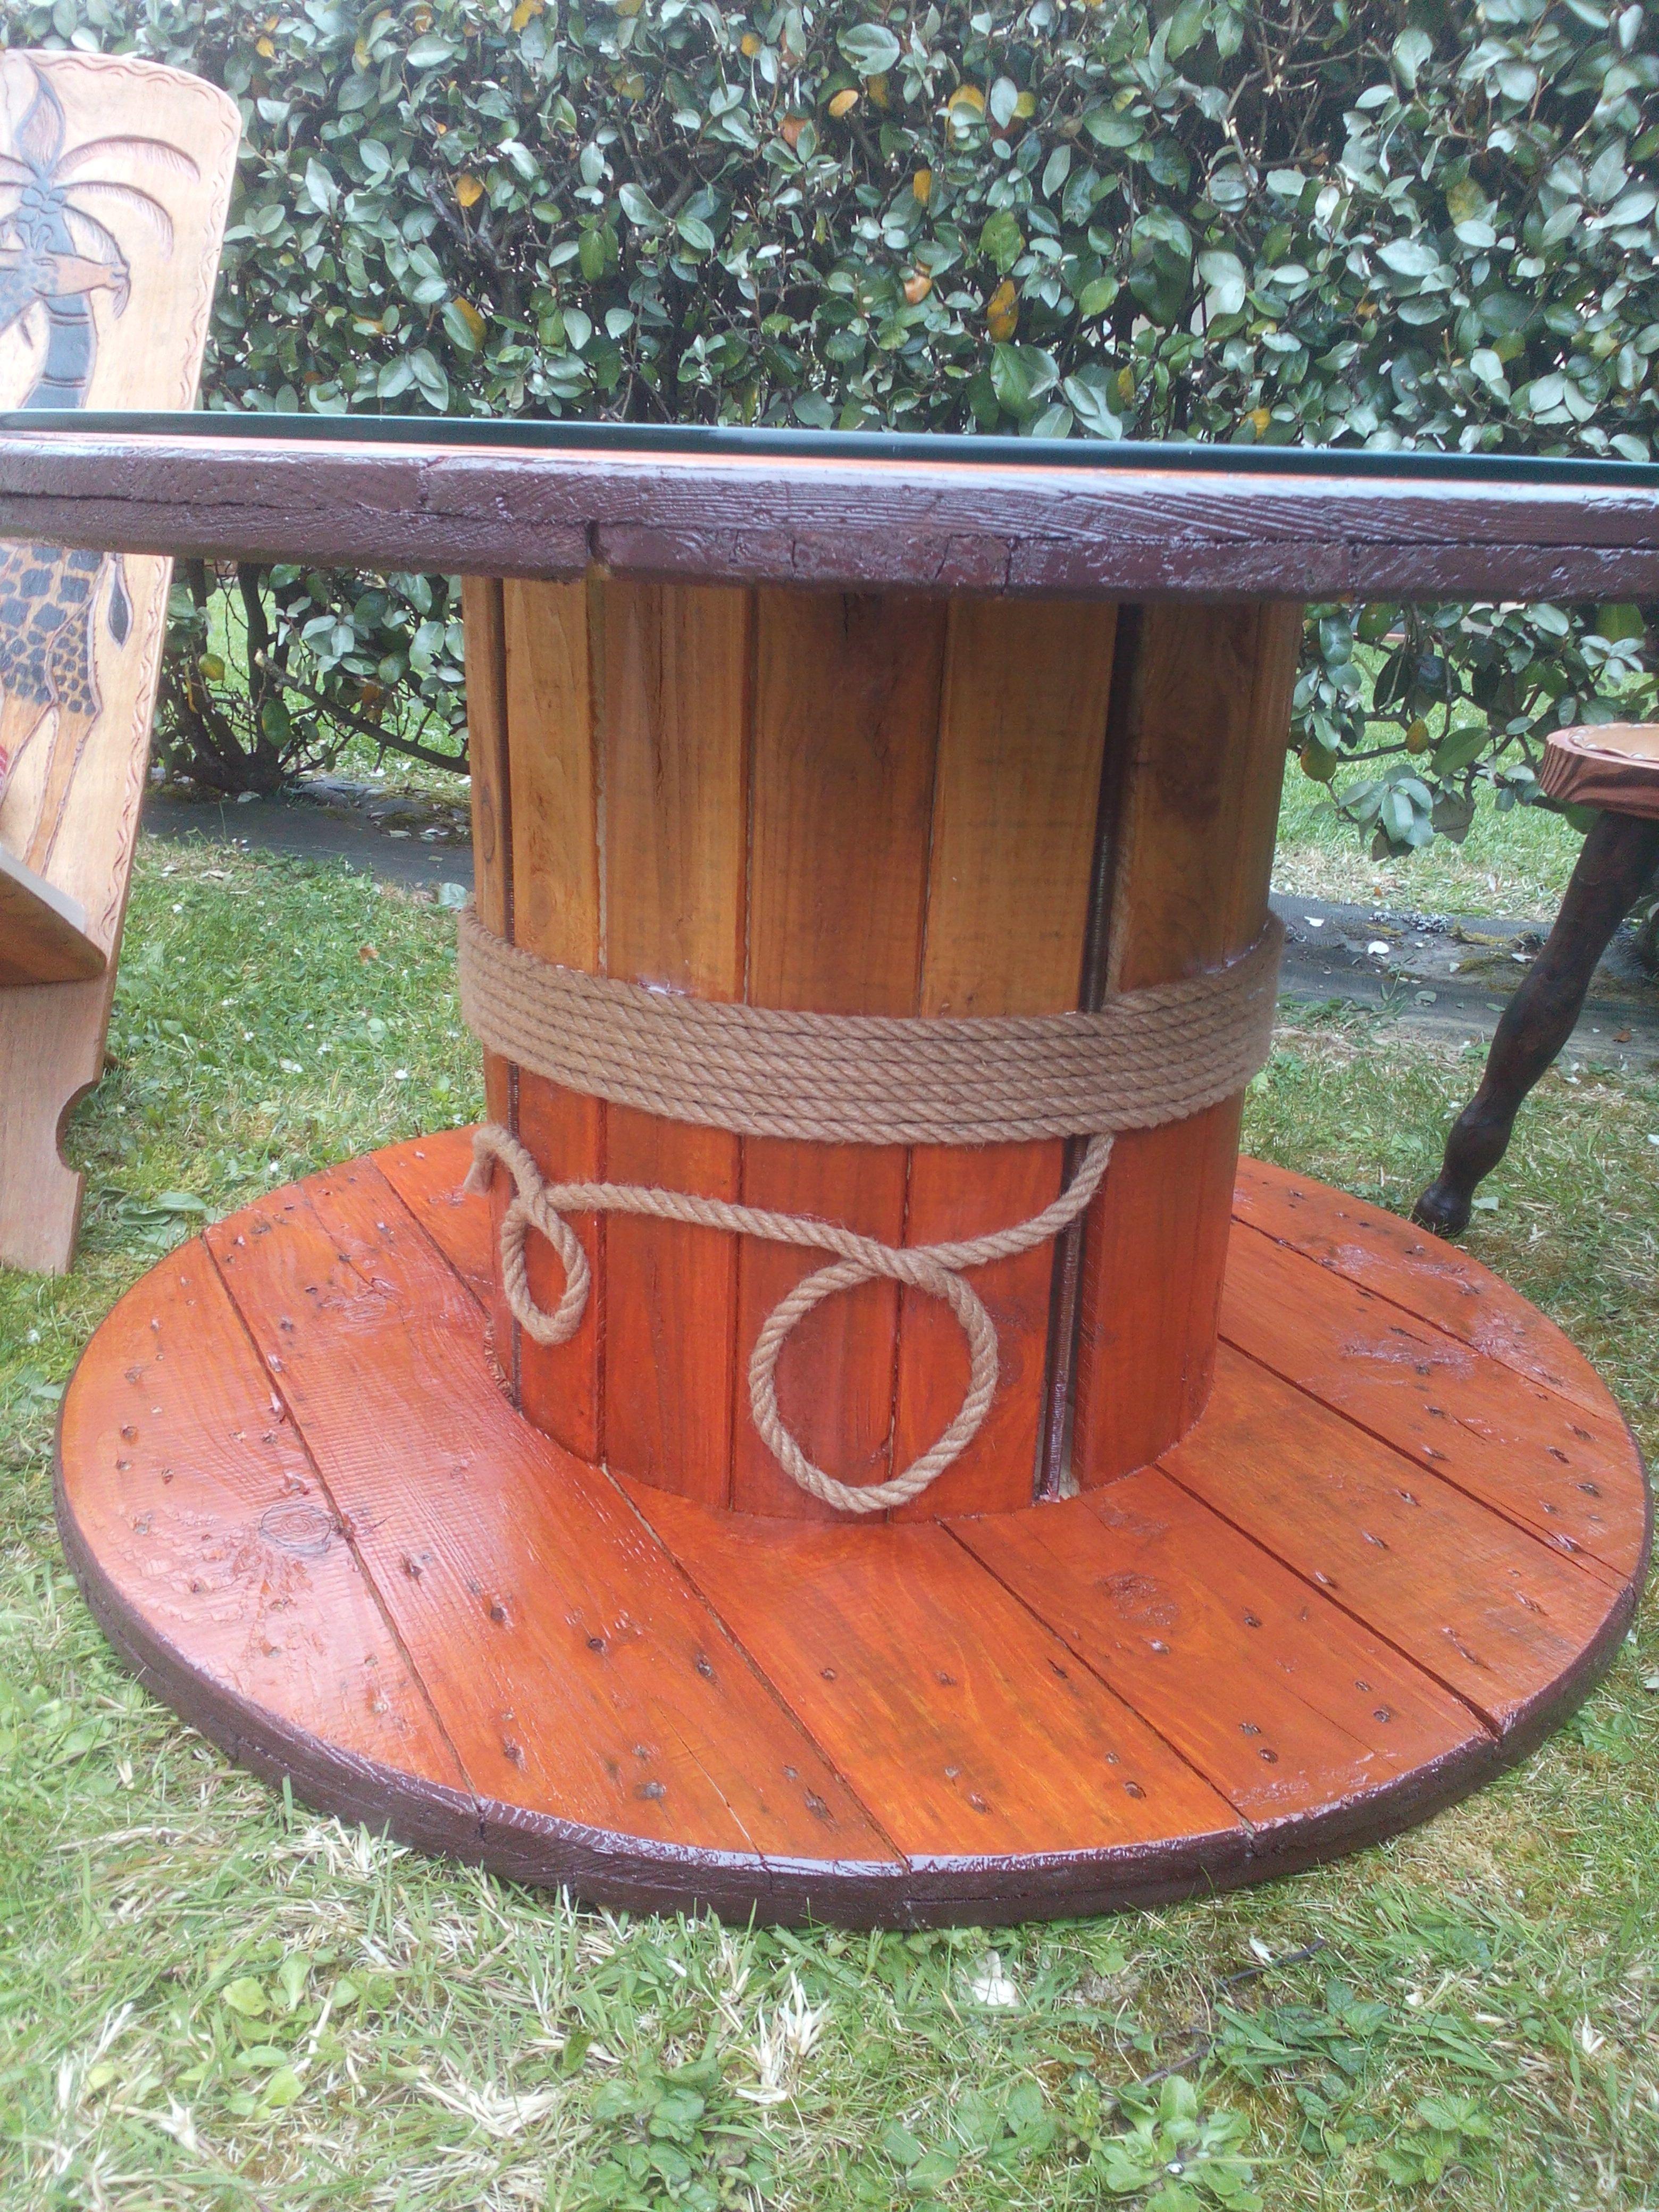 touret bois table basse table basse en touret guide astuces with touret bois table basse. Black Bedroom Furniture Sets. Home Design Ideas